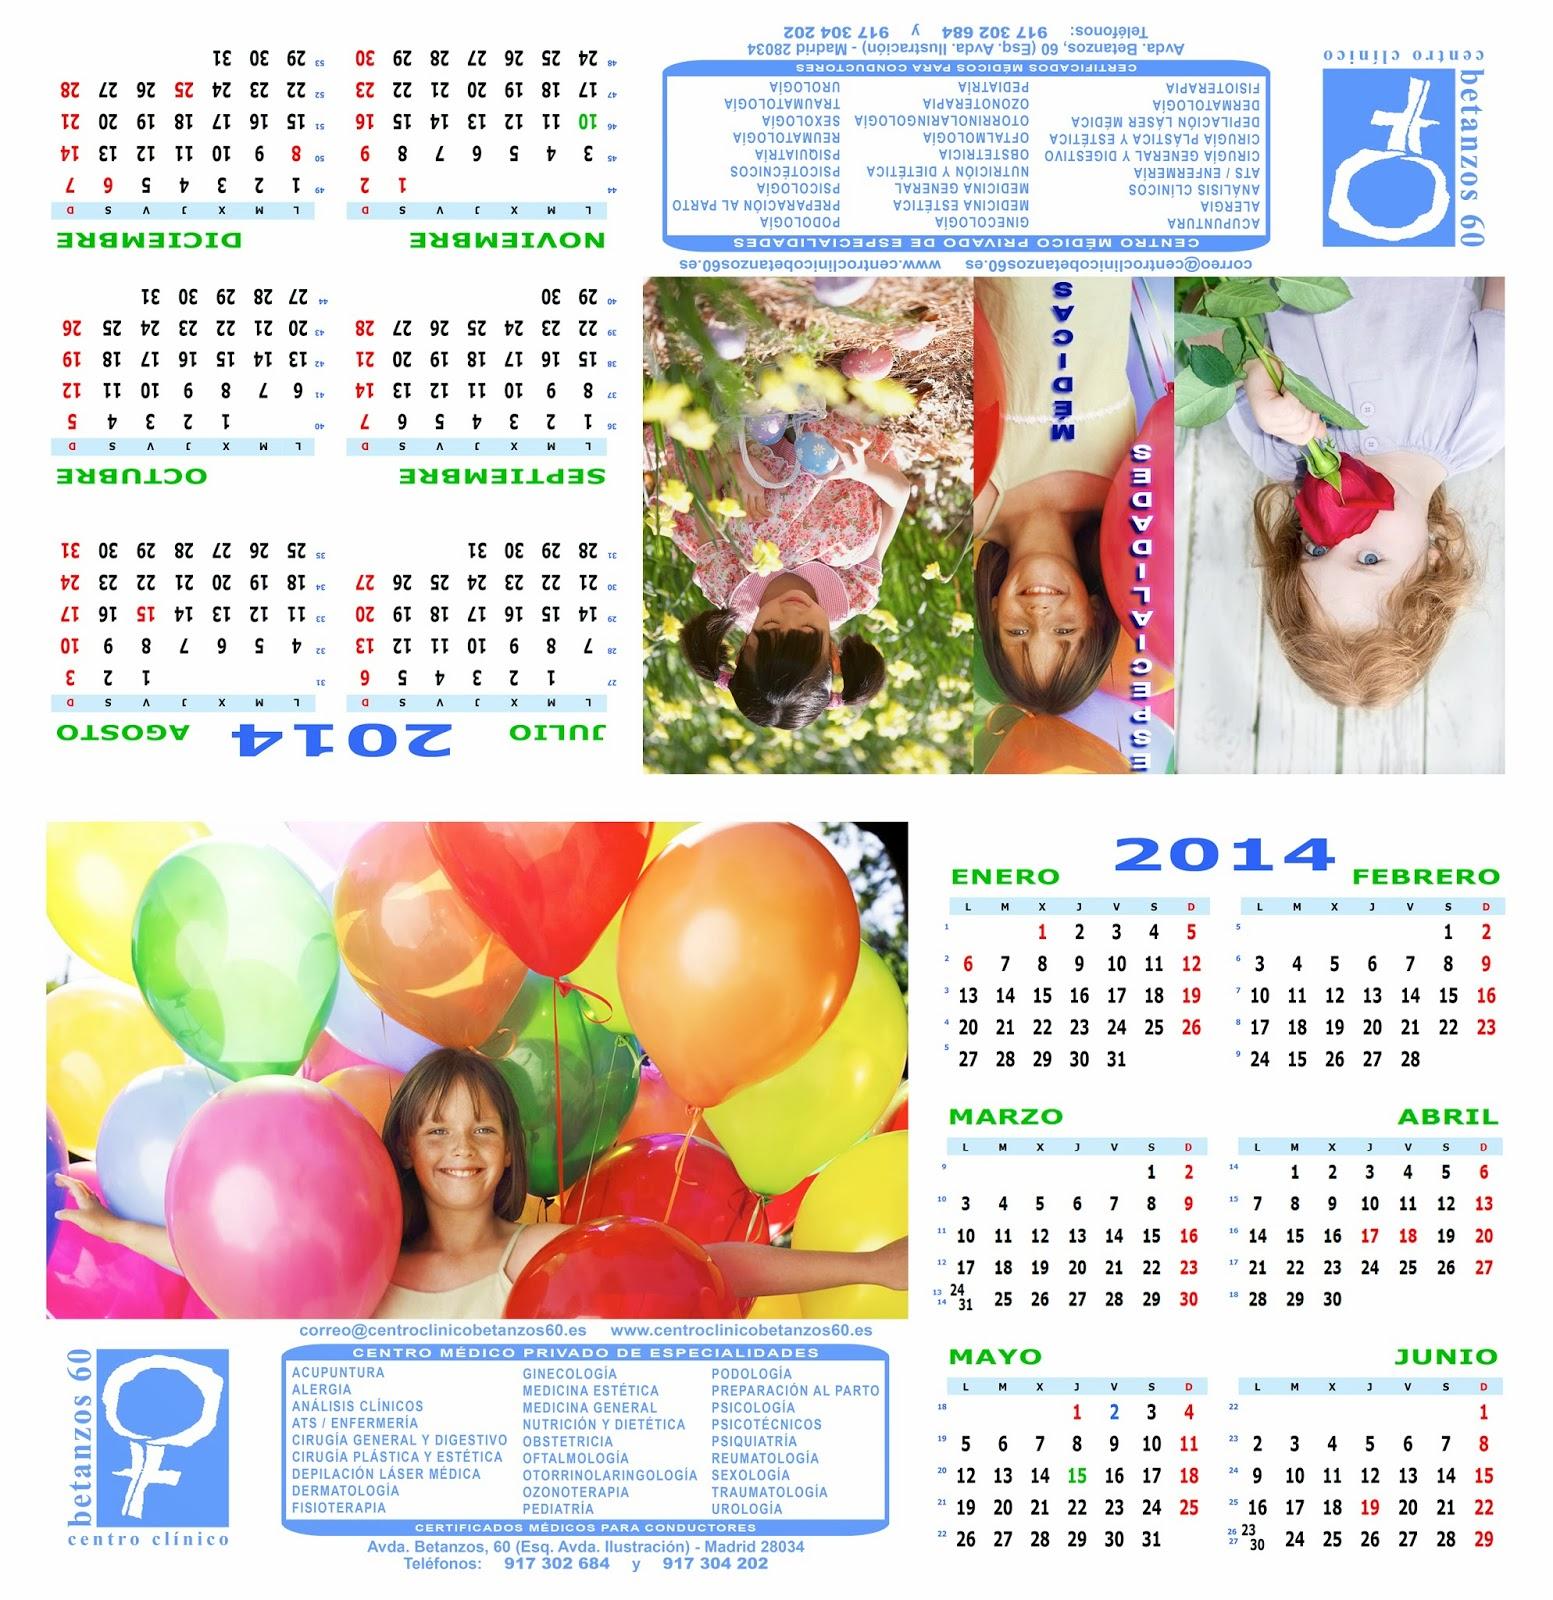 Diseño del calendario semestral 2014 especial de sobremesa